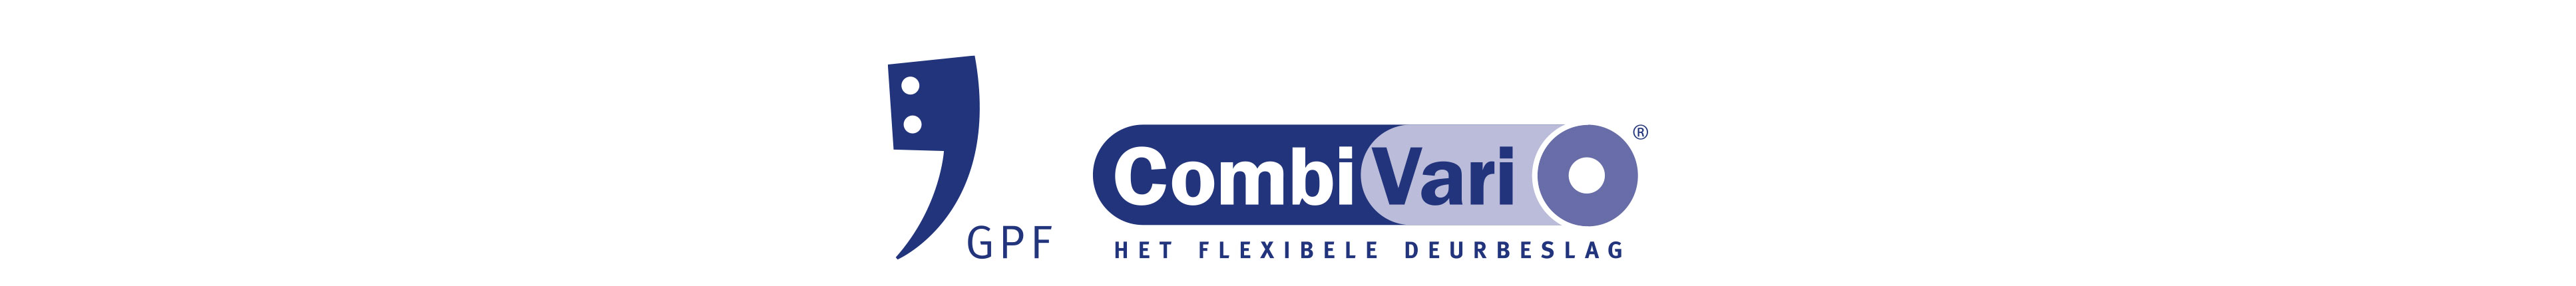 Logo GPF CombiVari